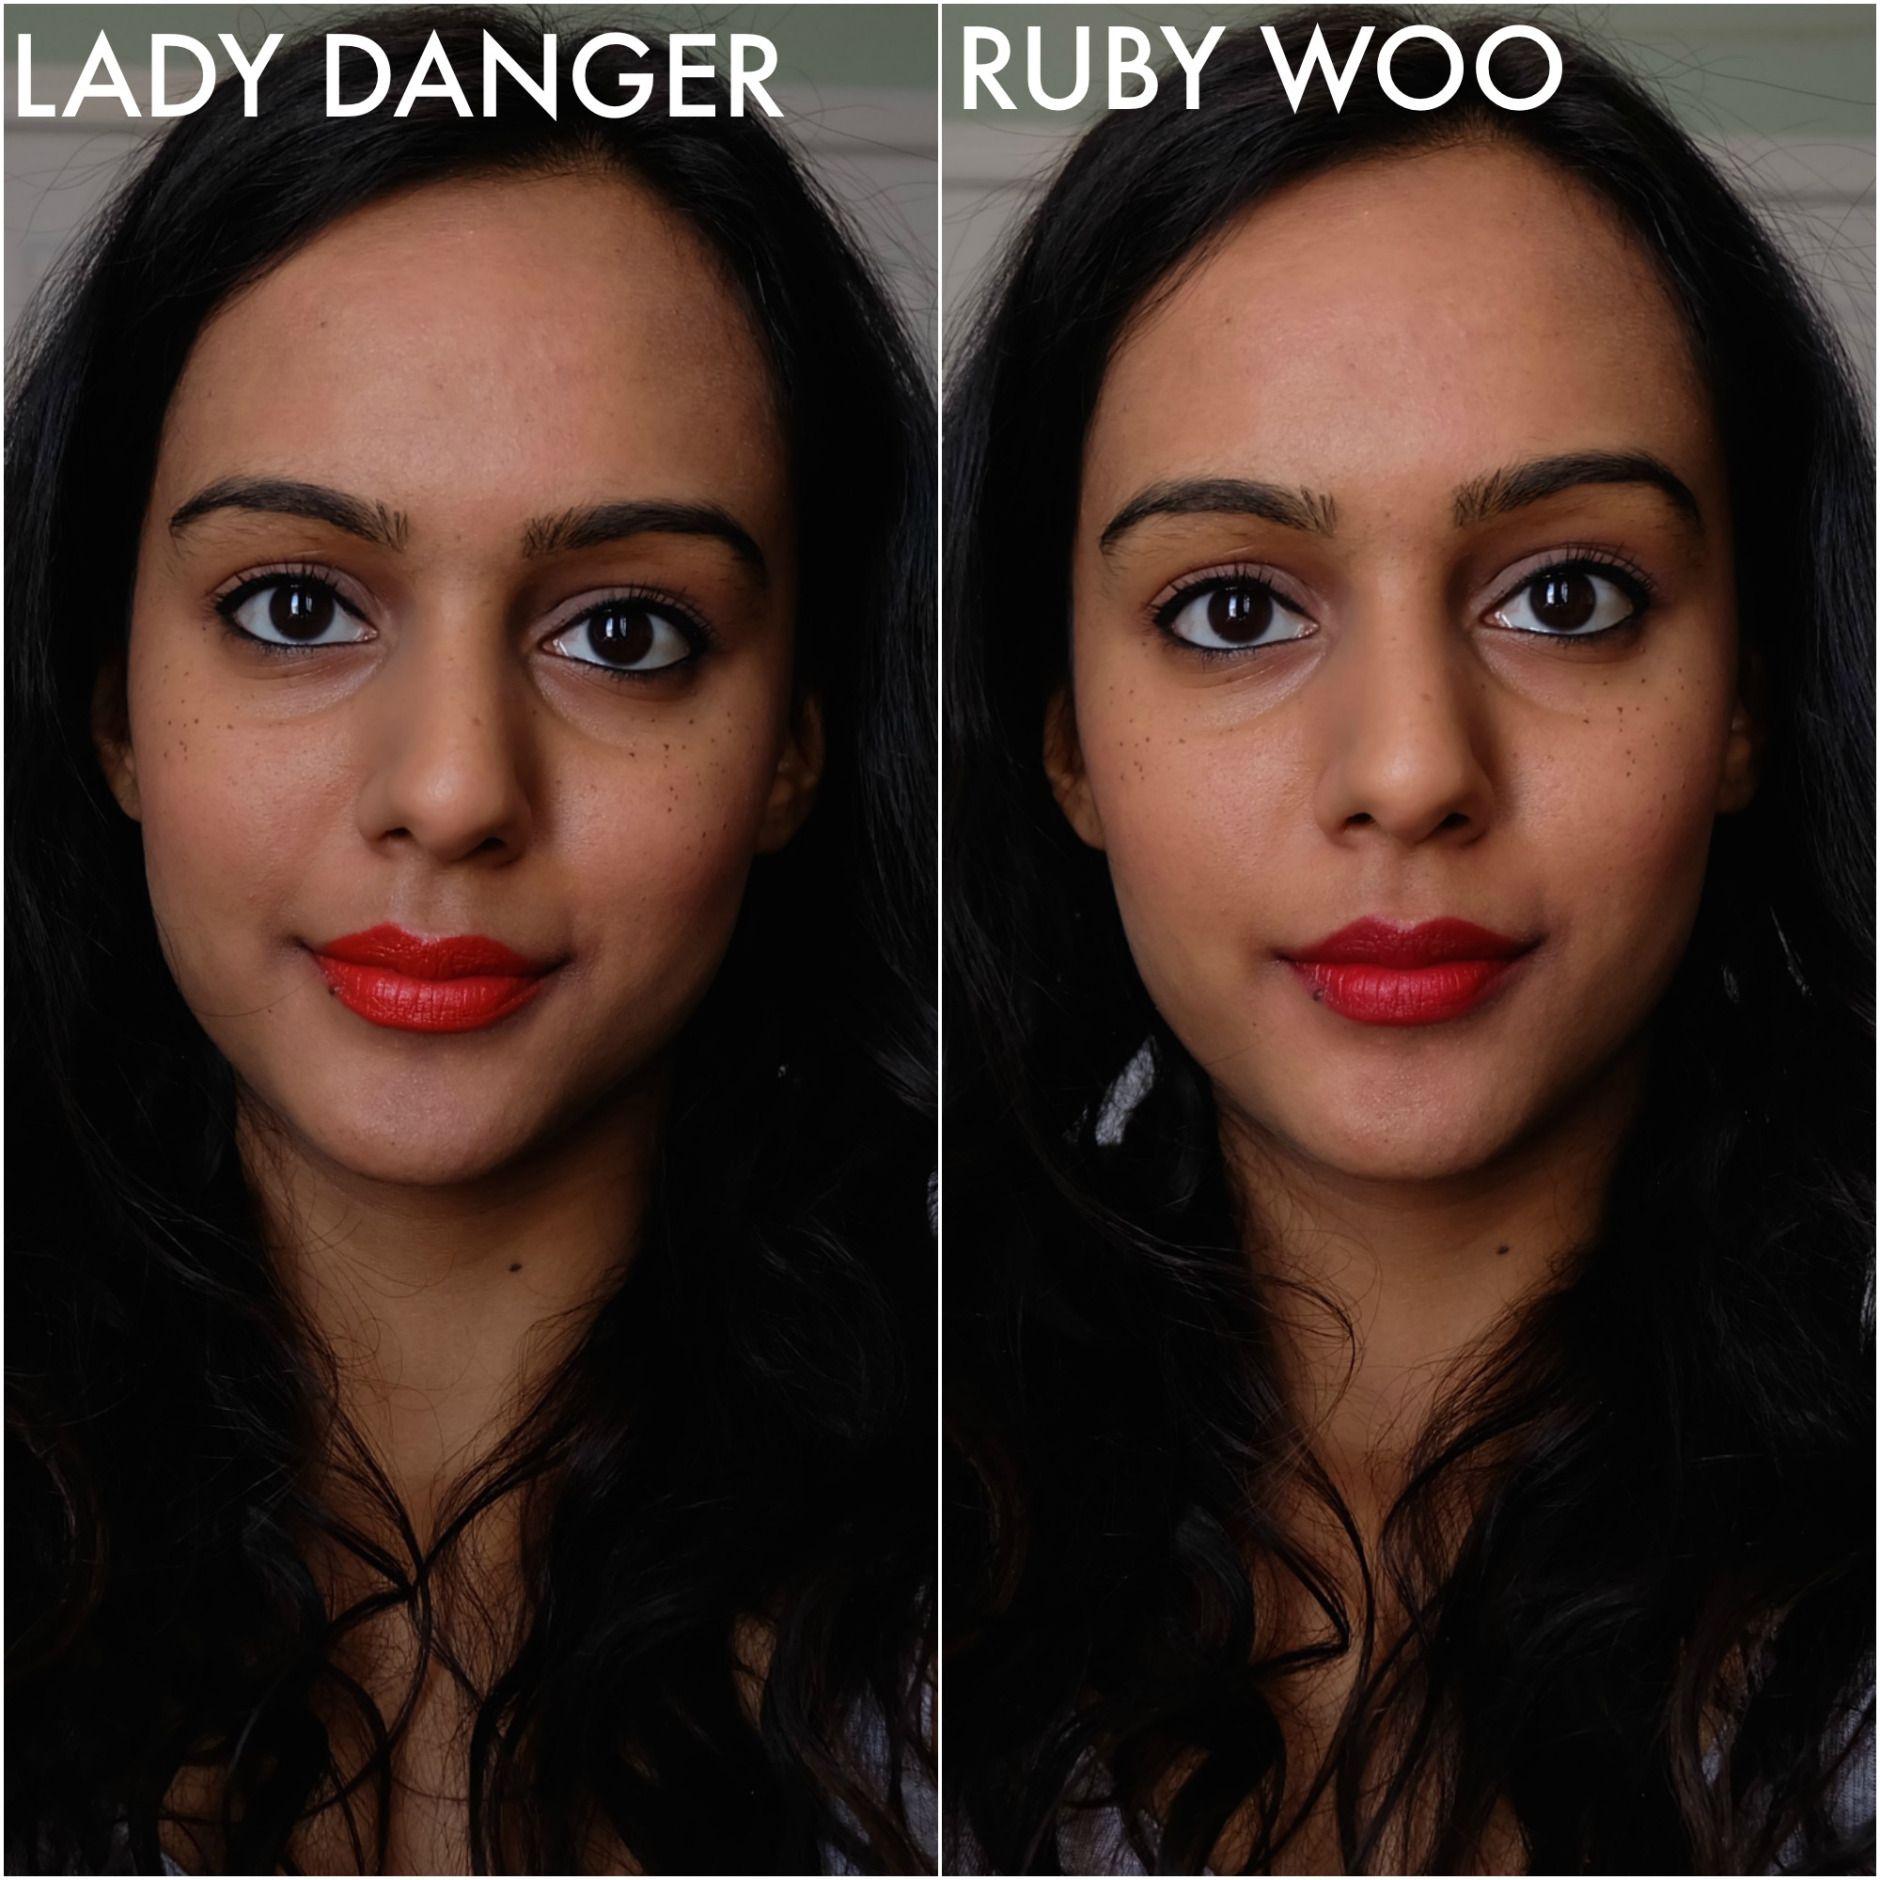 Lady Danger Ruby Woo | Lipstick for dark skin, Bright ...